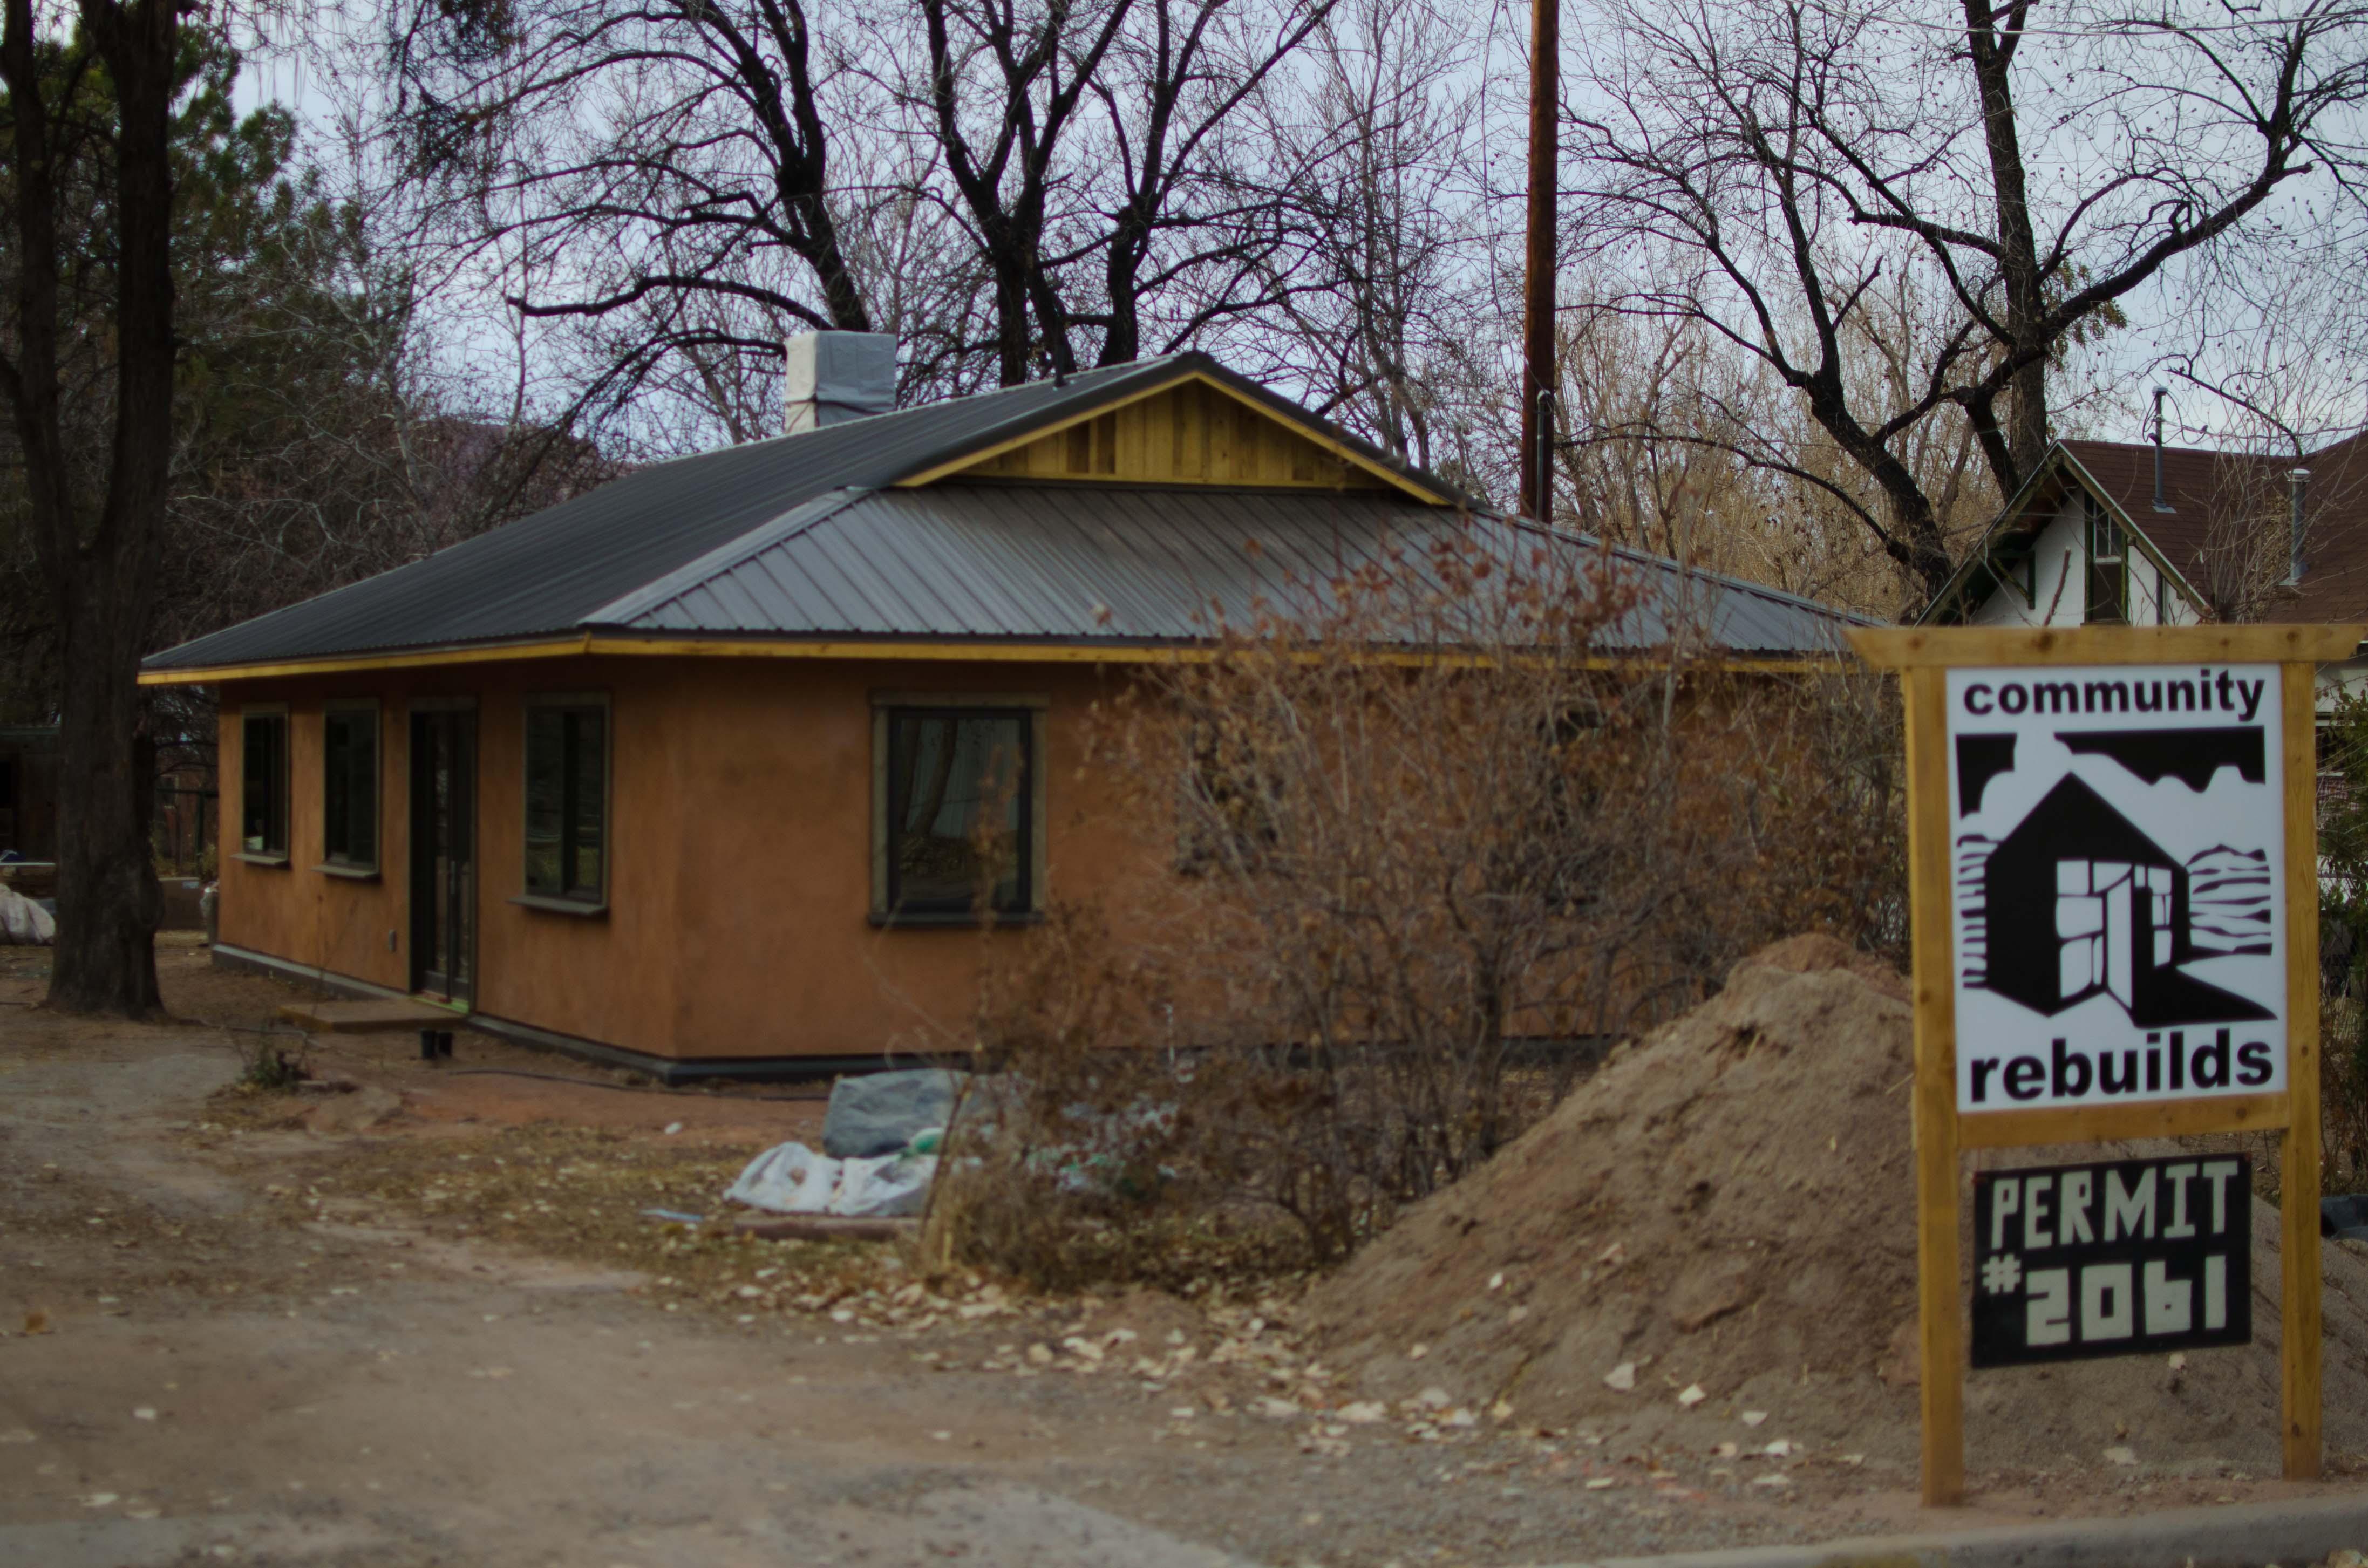 Community Rebuilds – Path to Zero Waste